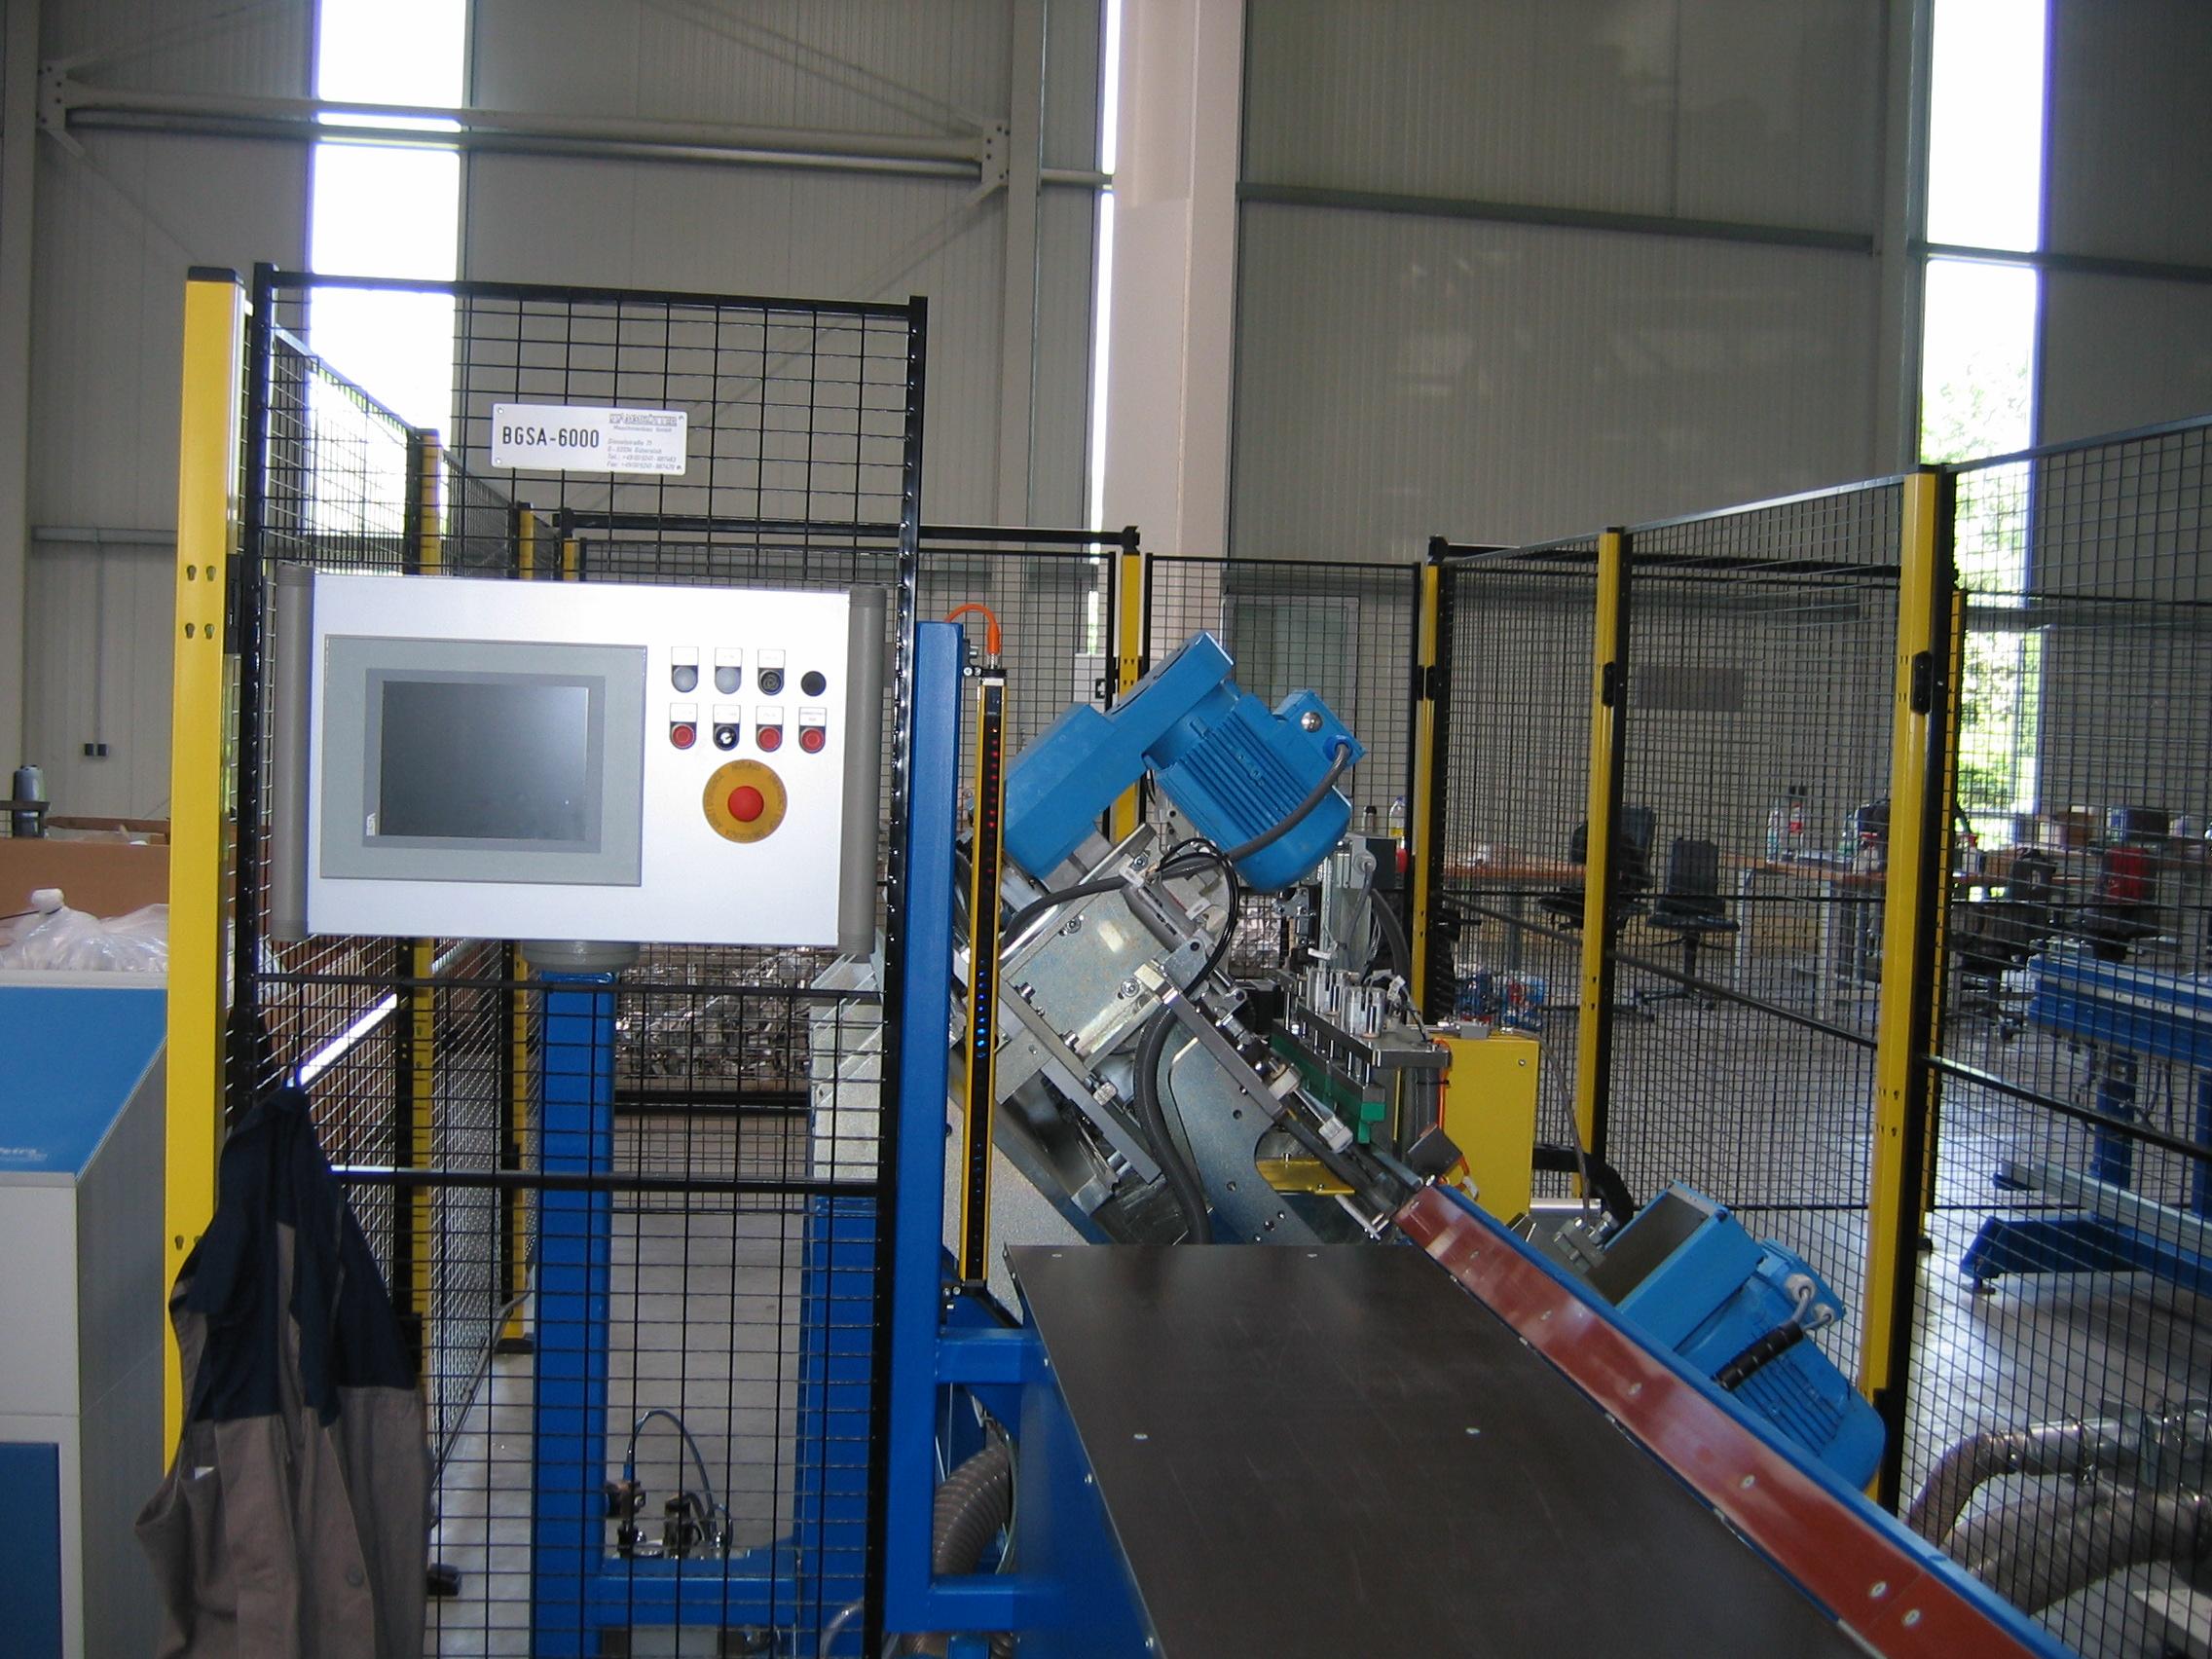 BGSA-6000